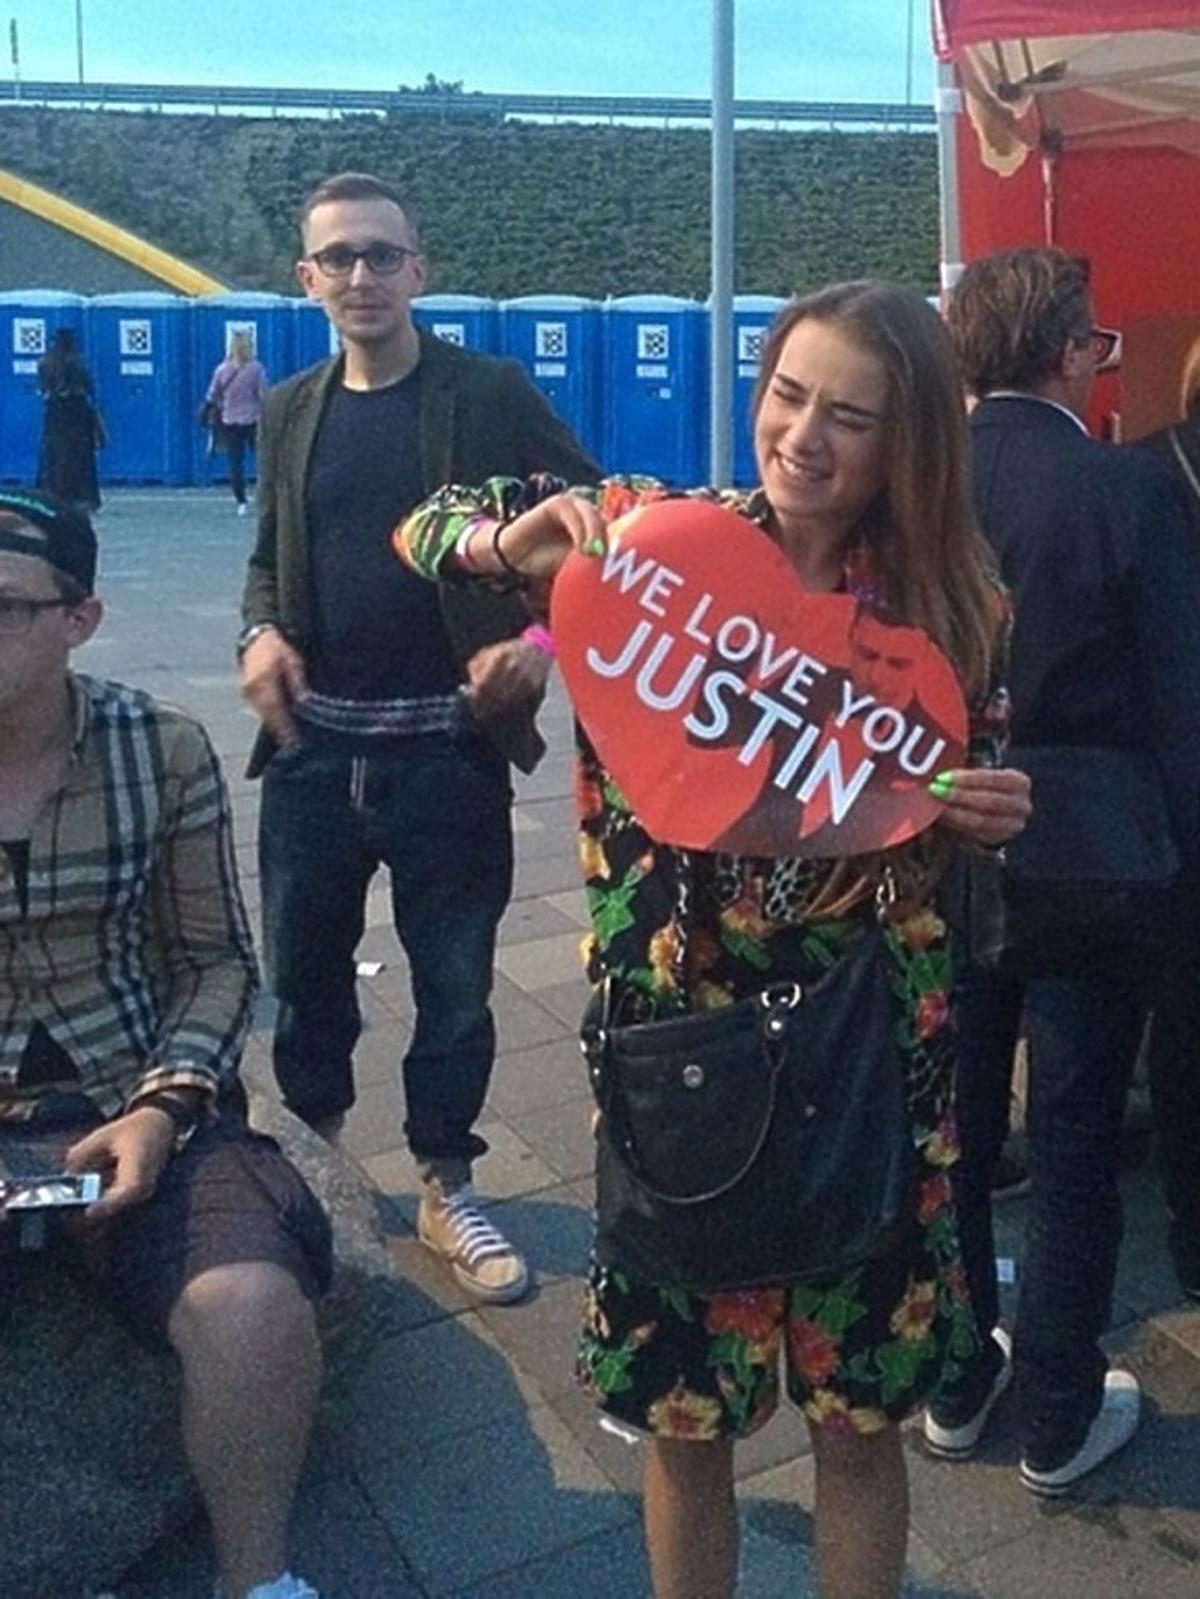 Julia Kuczyńska Maffashion na koncercie Justina Timberlake'a w Gdańsku